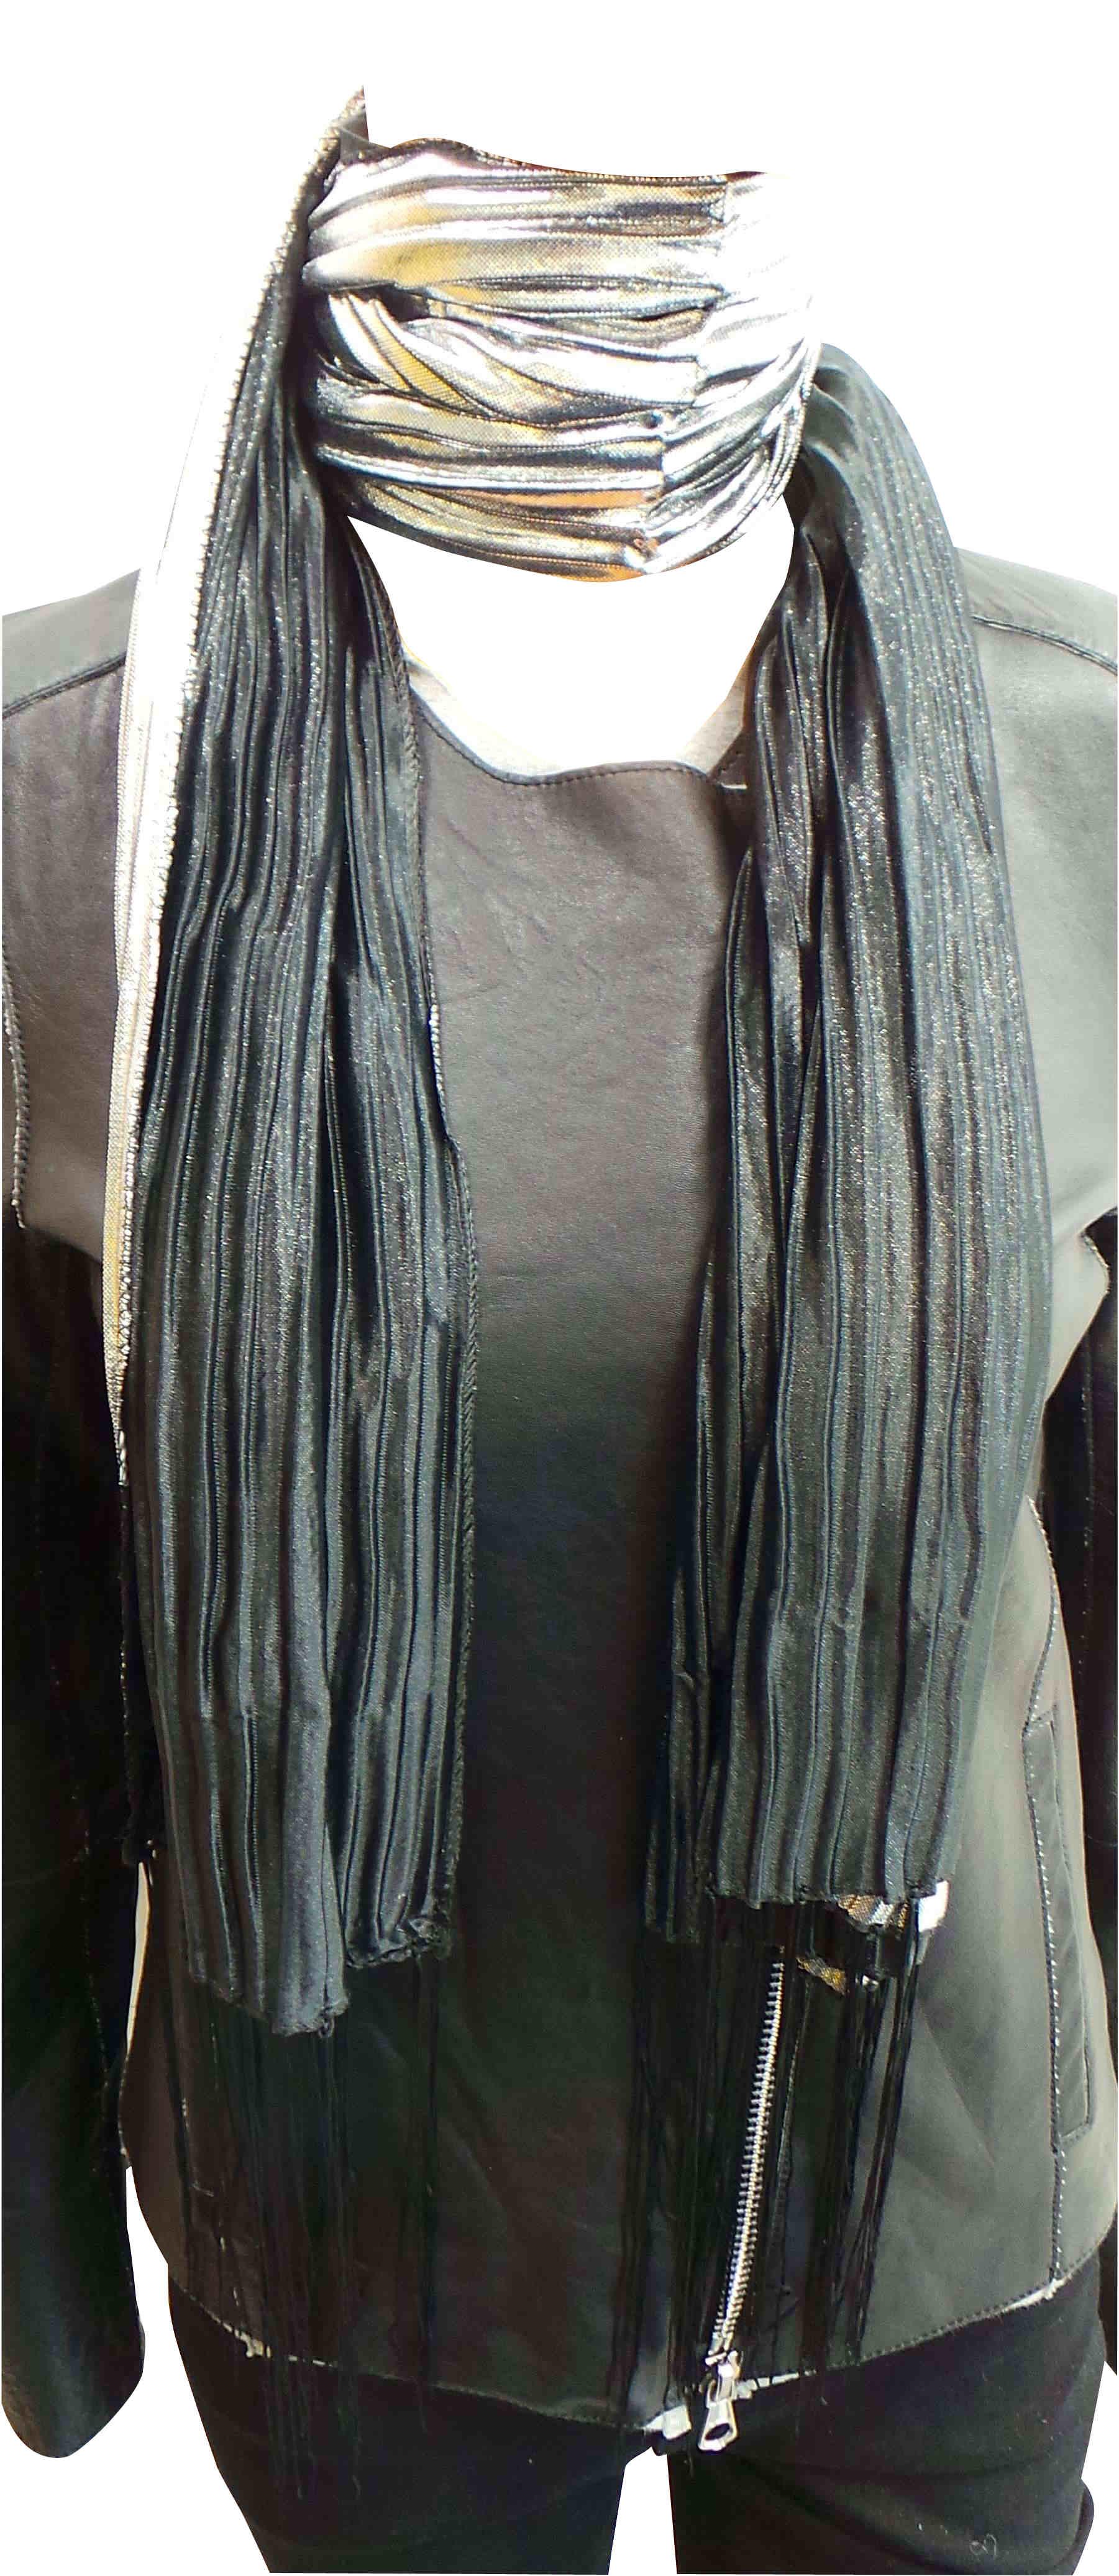 wholesale joblot of 24 metallic black tassel scarves